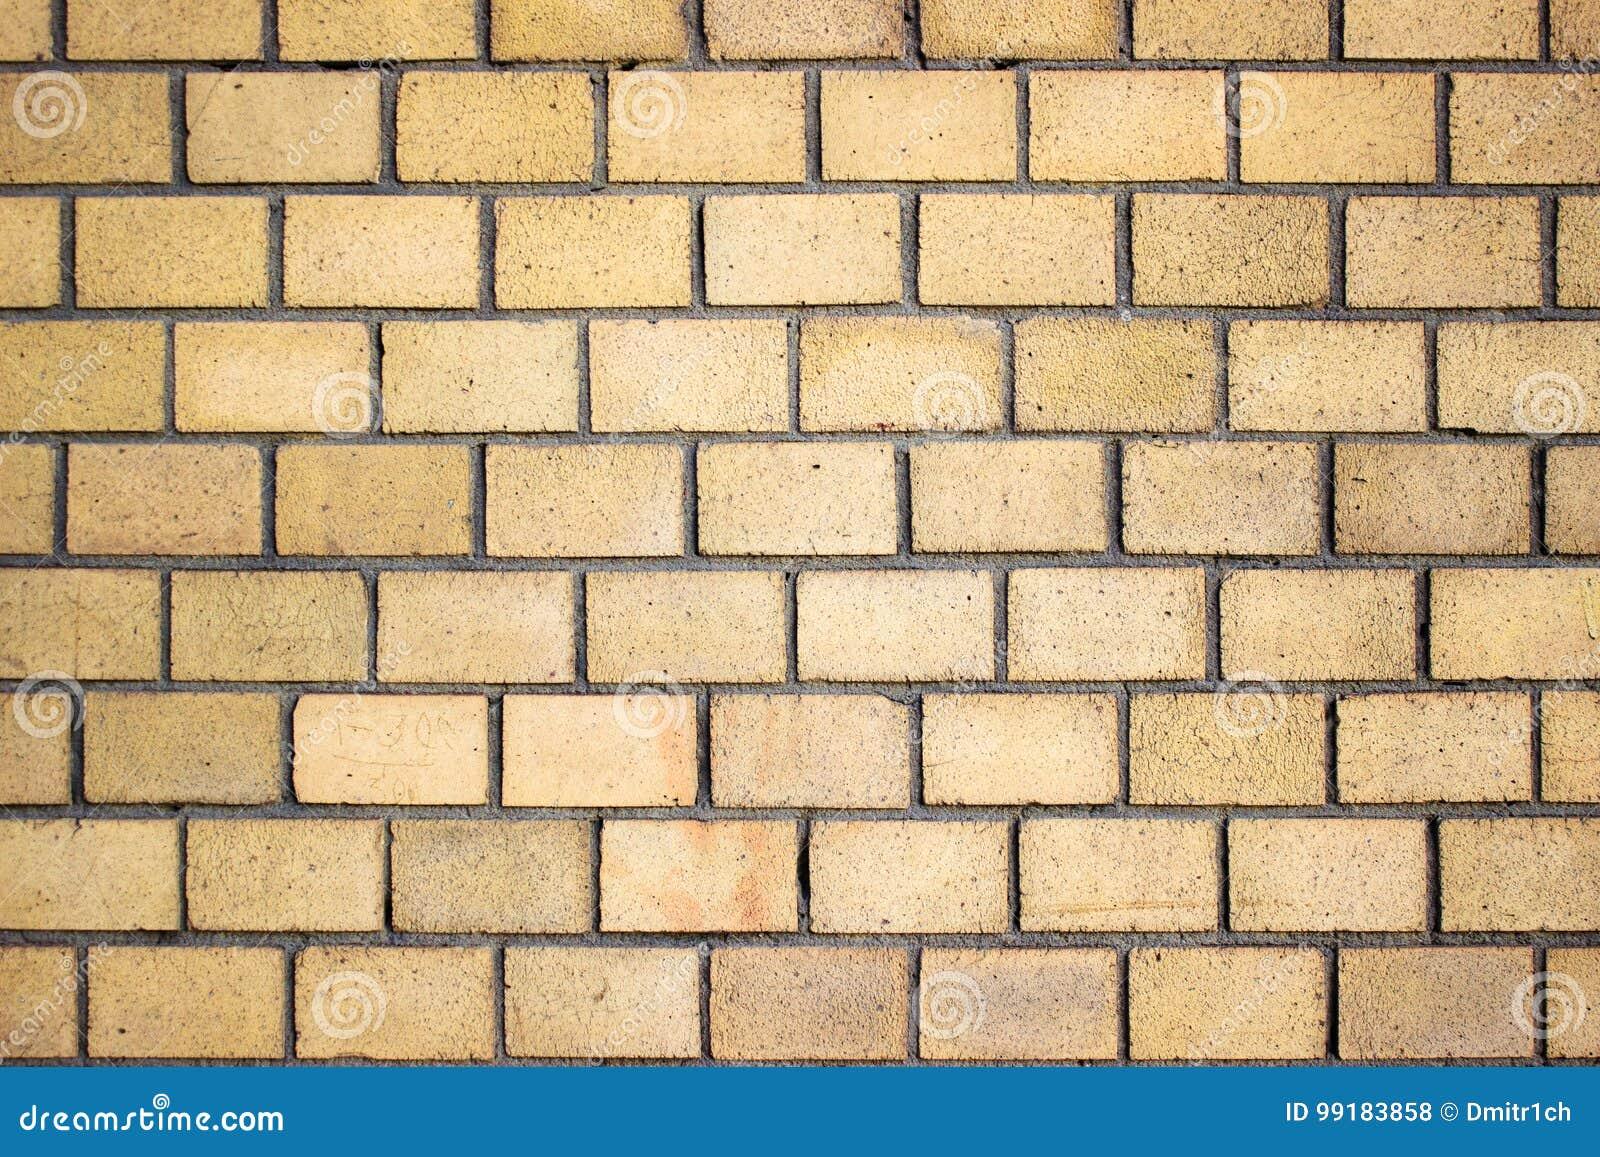 Fine Brick Wall Colors Image - Art & Wall Decor - hecatalog.info